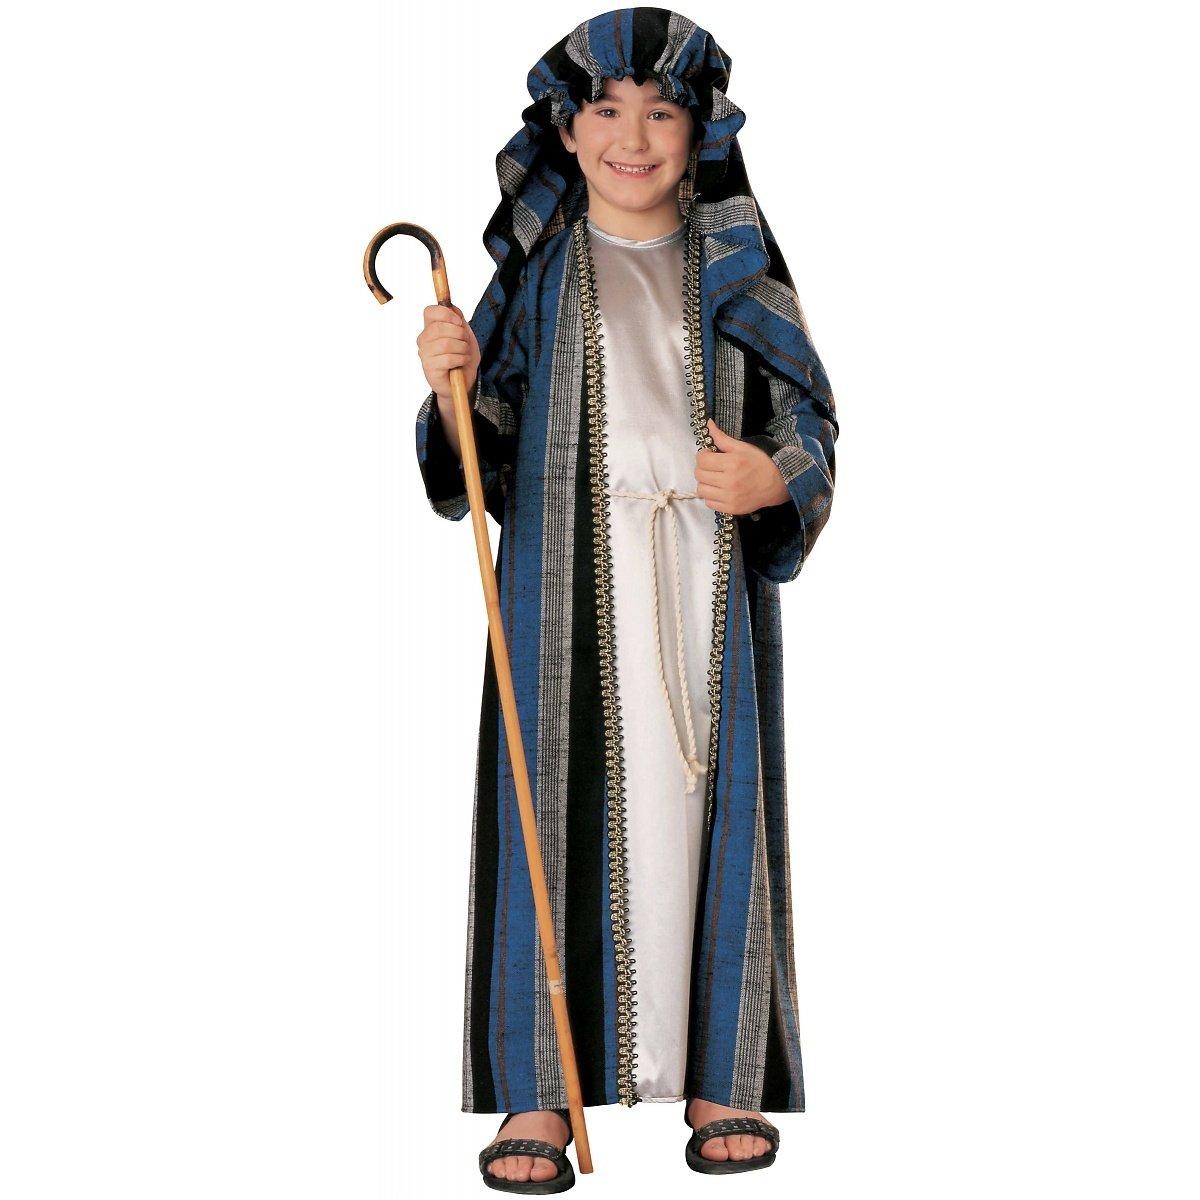 sc 1 st  Amazon.com & Amazon.com: Shepherd Boy Child Costume - Medium: Toys u0026 Games